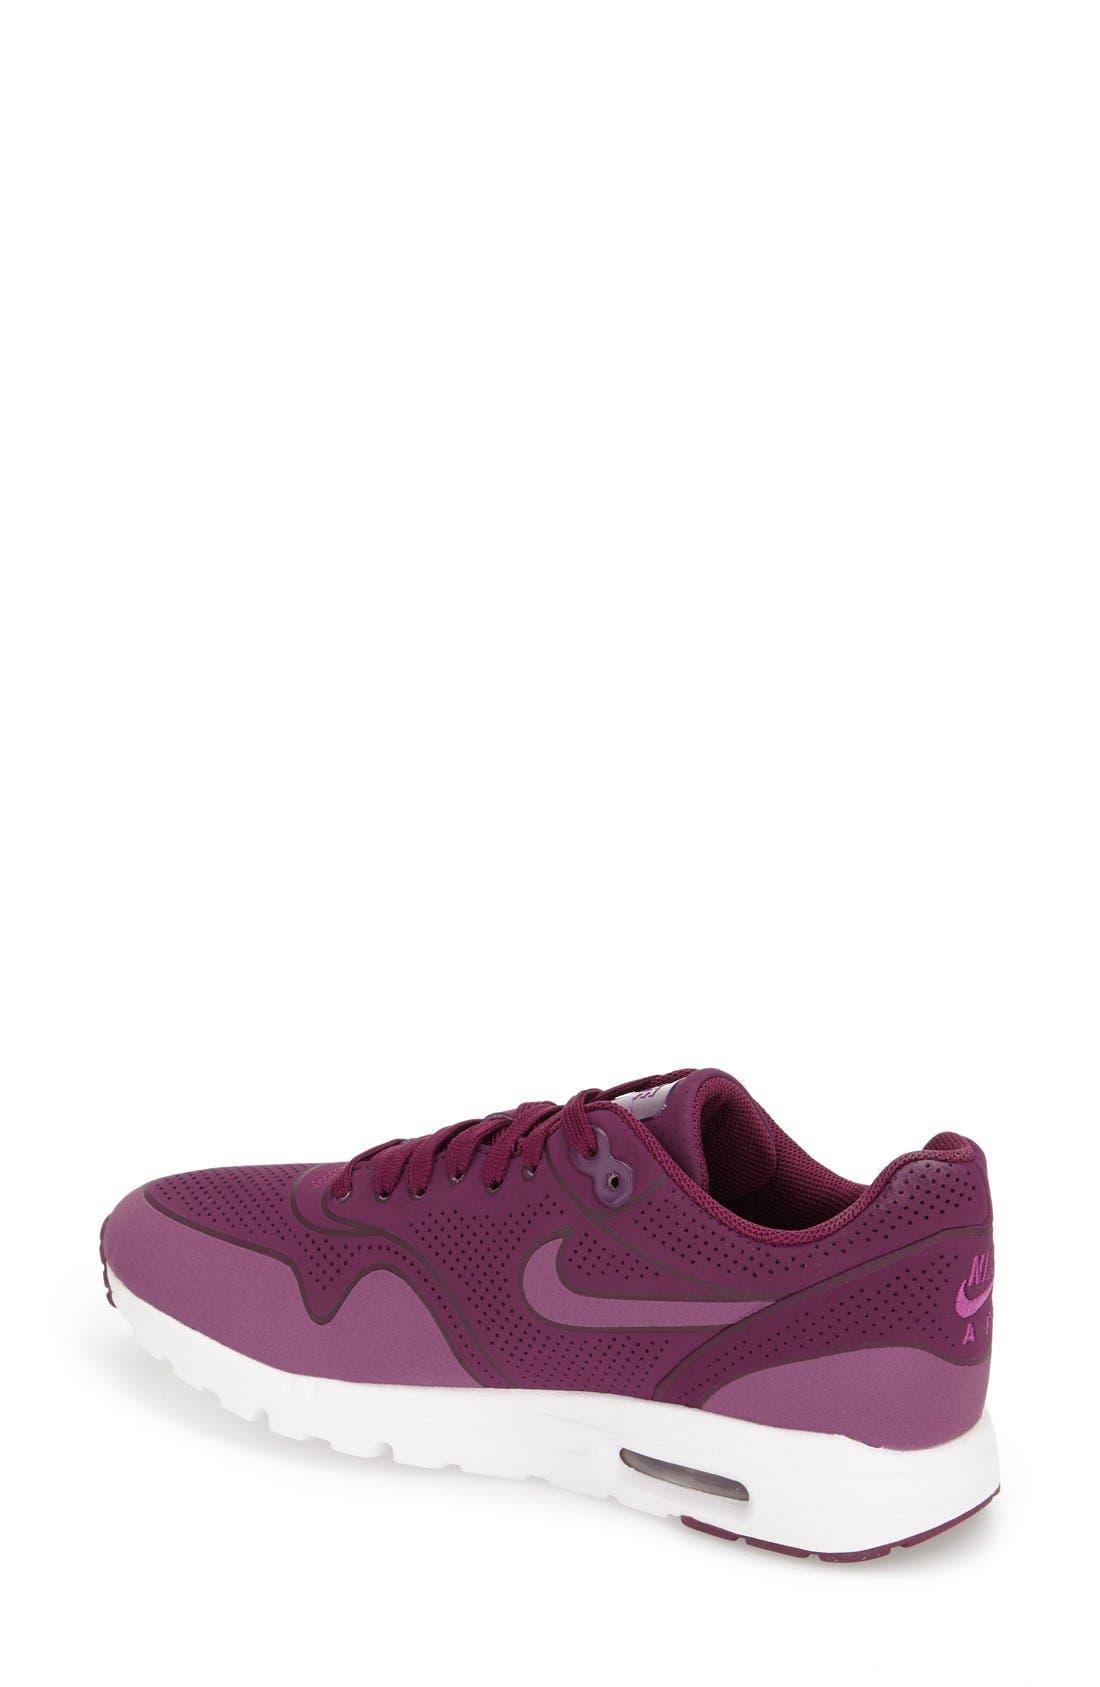 ,                             'Air Max 1 - Ultra Moire' Sneaker,                             Alternate thumbnail 92, color,                             500